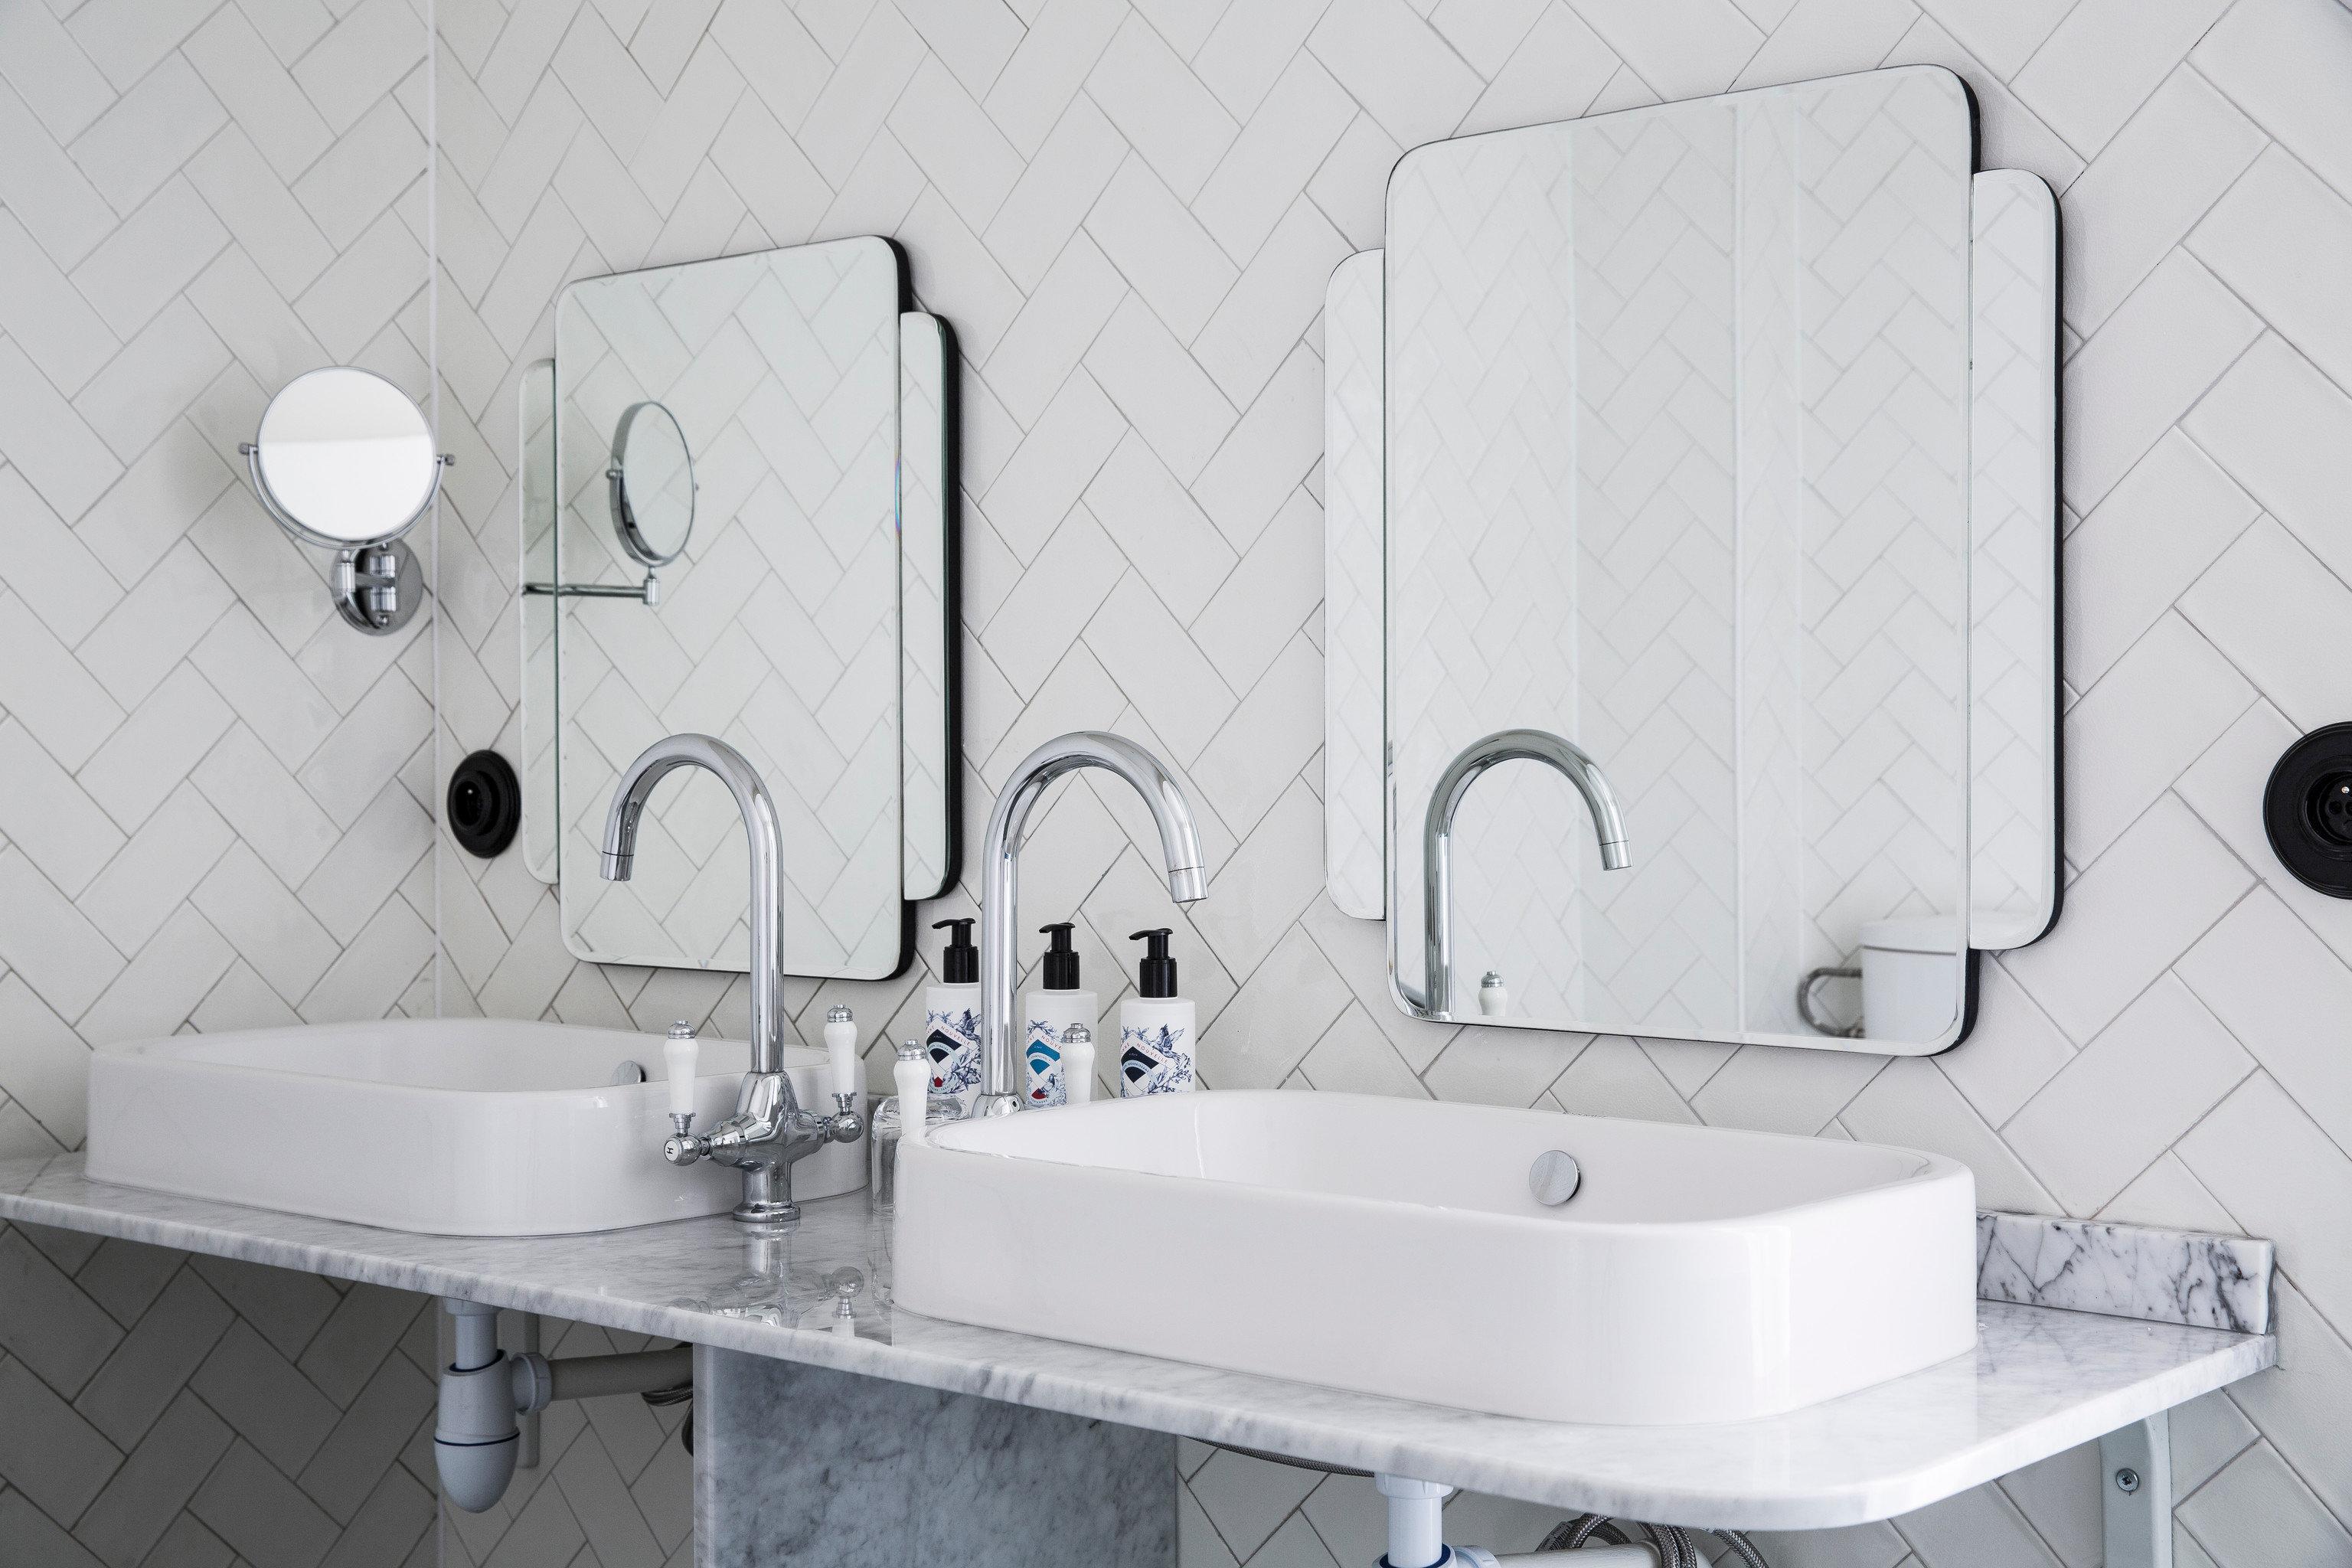 bathroom sink toilet bidet plumbing fixture bathtub tile tiled water basin